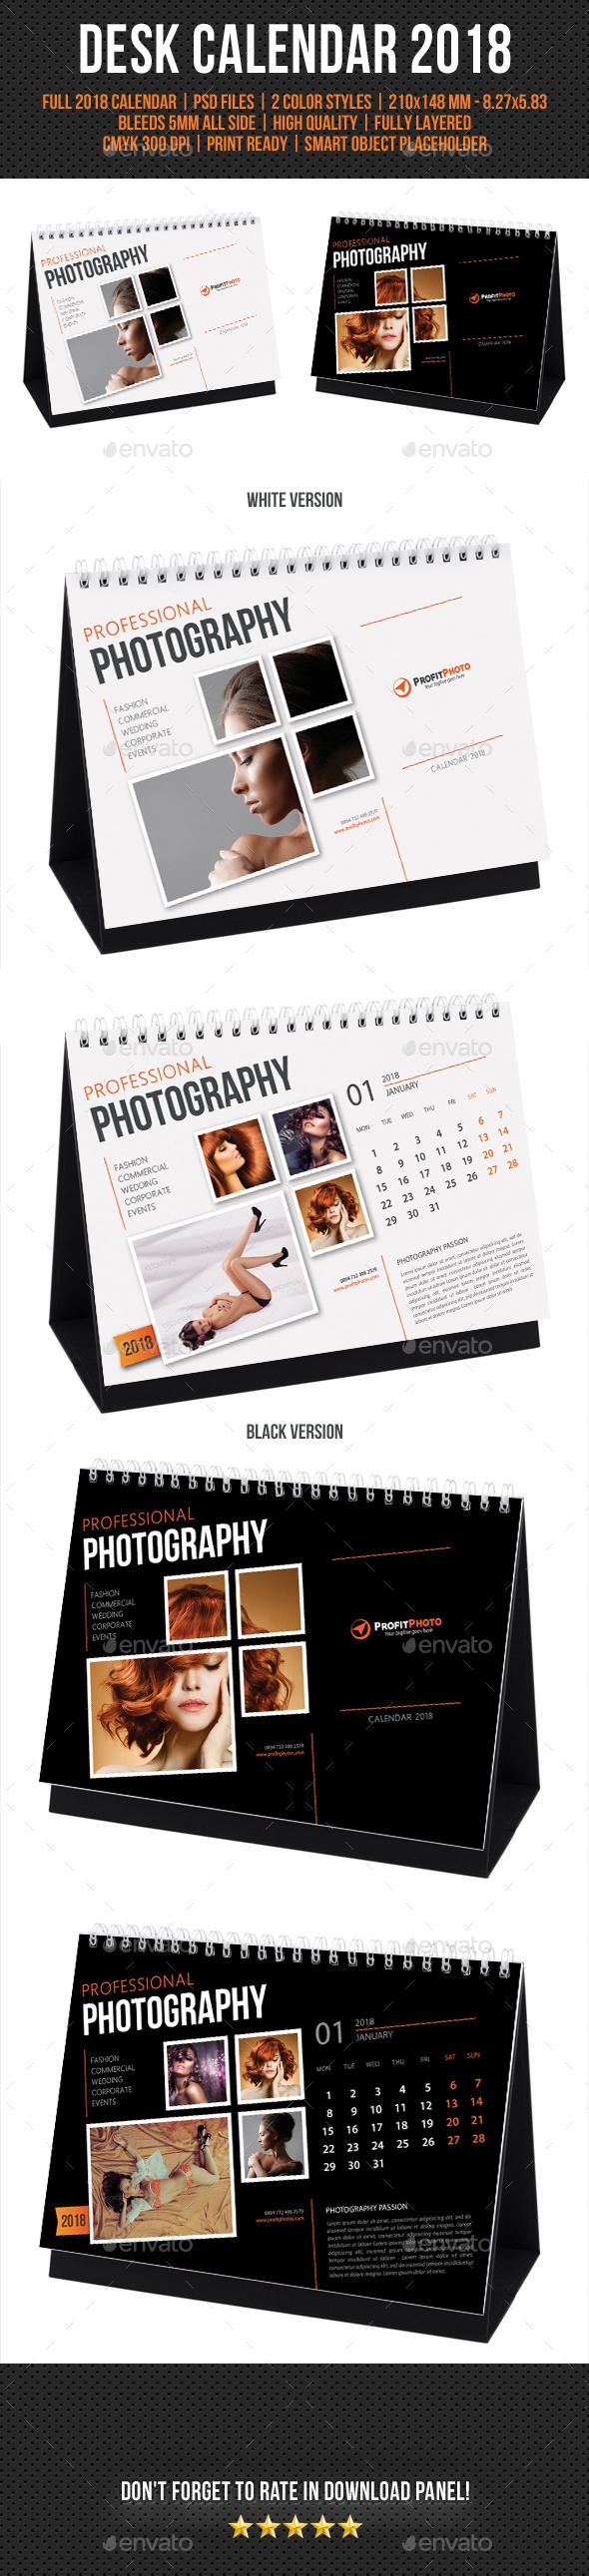 Creative Desk Calendar 2018 - Calendars Stationery